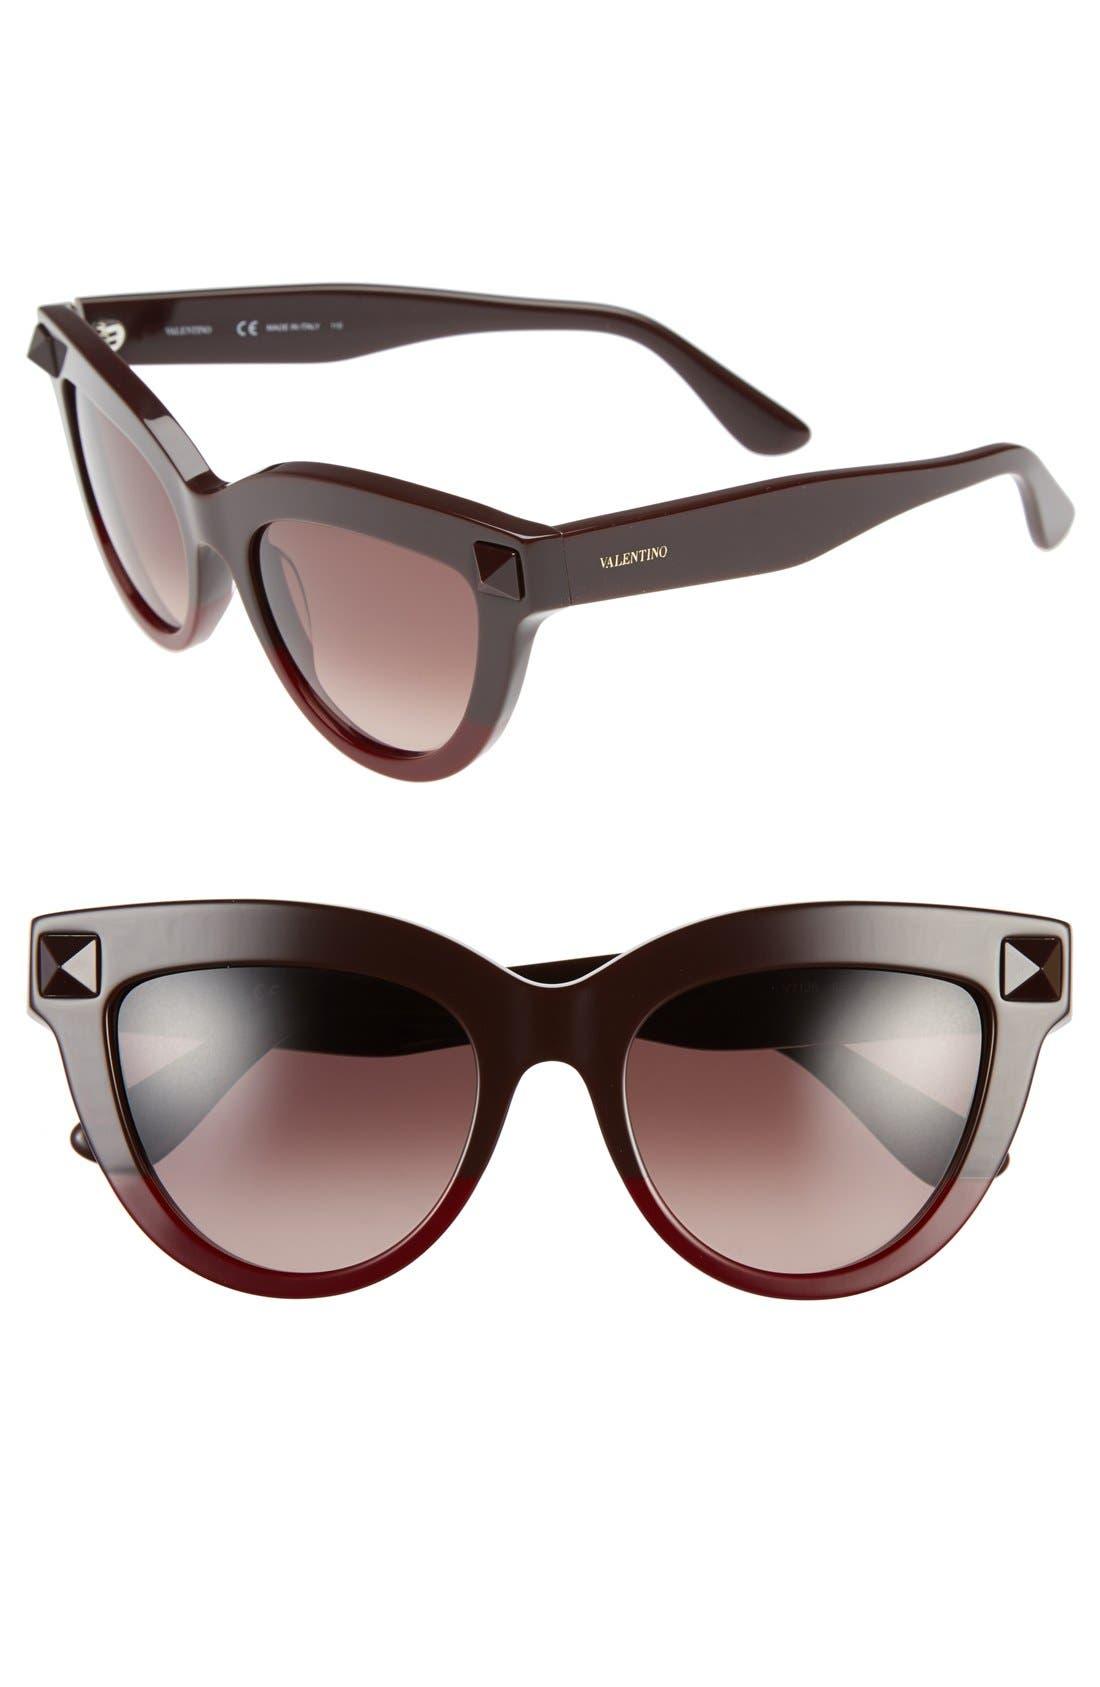 Alternate Image 1 Selected - Valentino 'Rockstud' 51mm Cat Eye Sunglasses